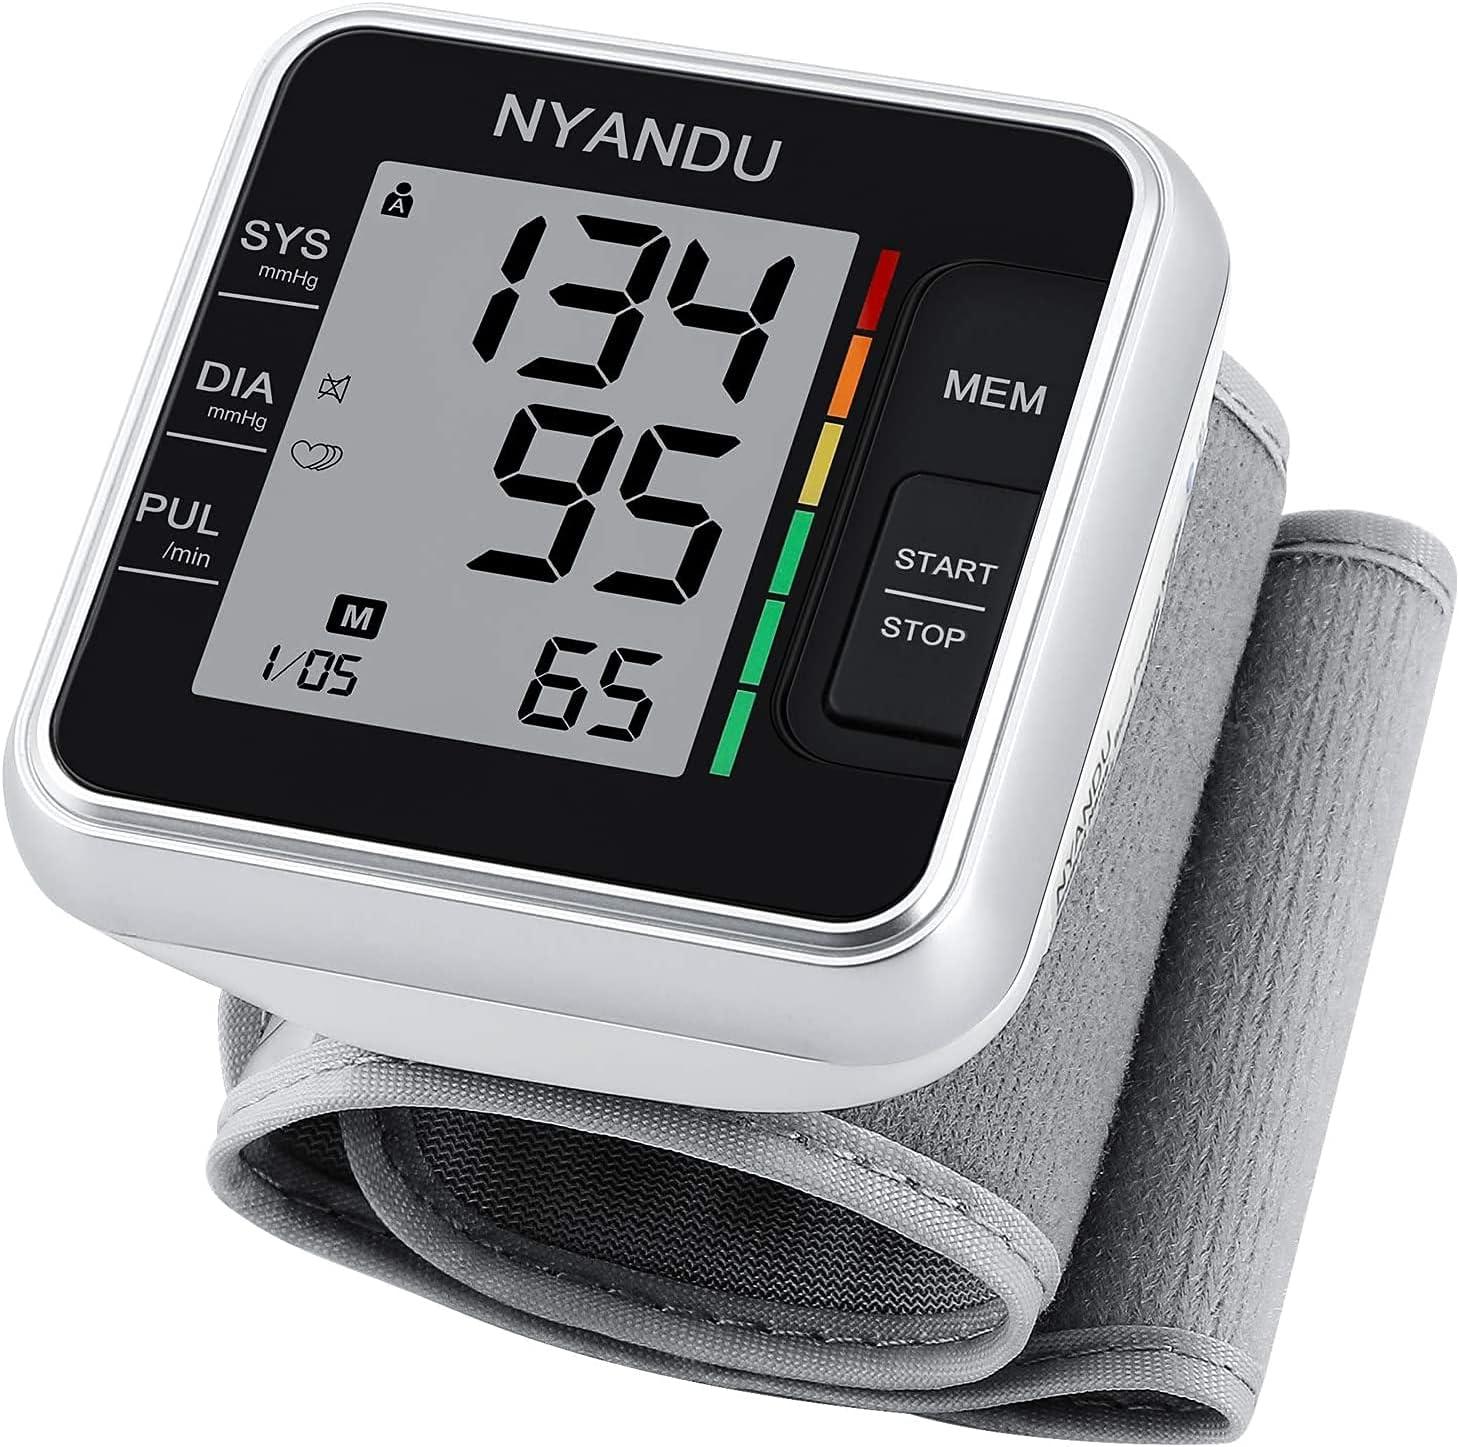 Selling and selling Blood Pressure Monitor NYANDU Max 66% OFF BP Heart Irregular Wrist